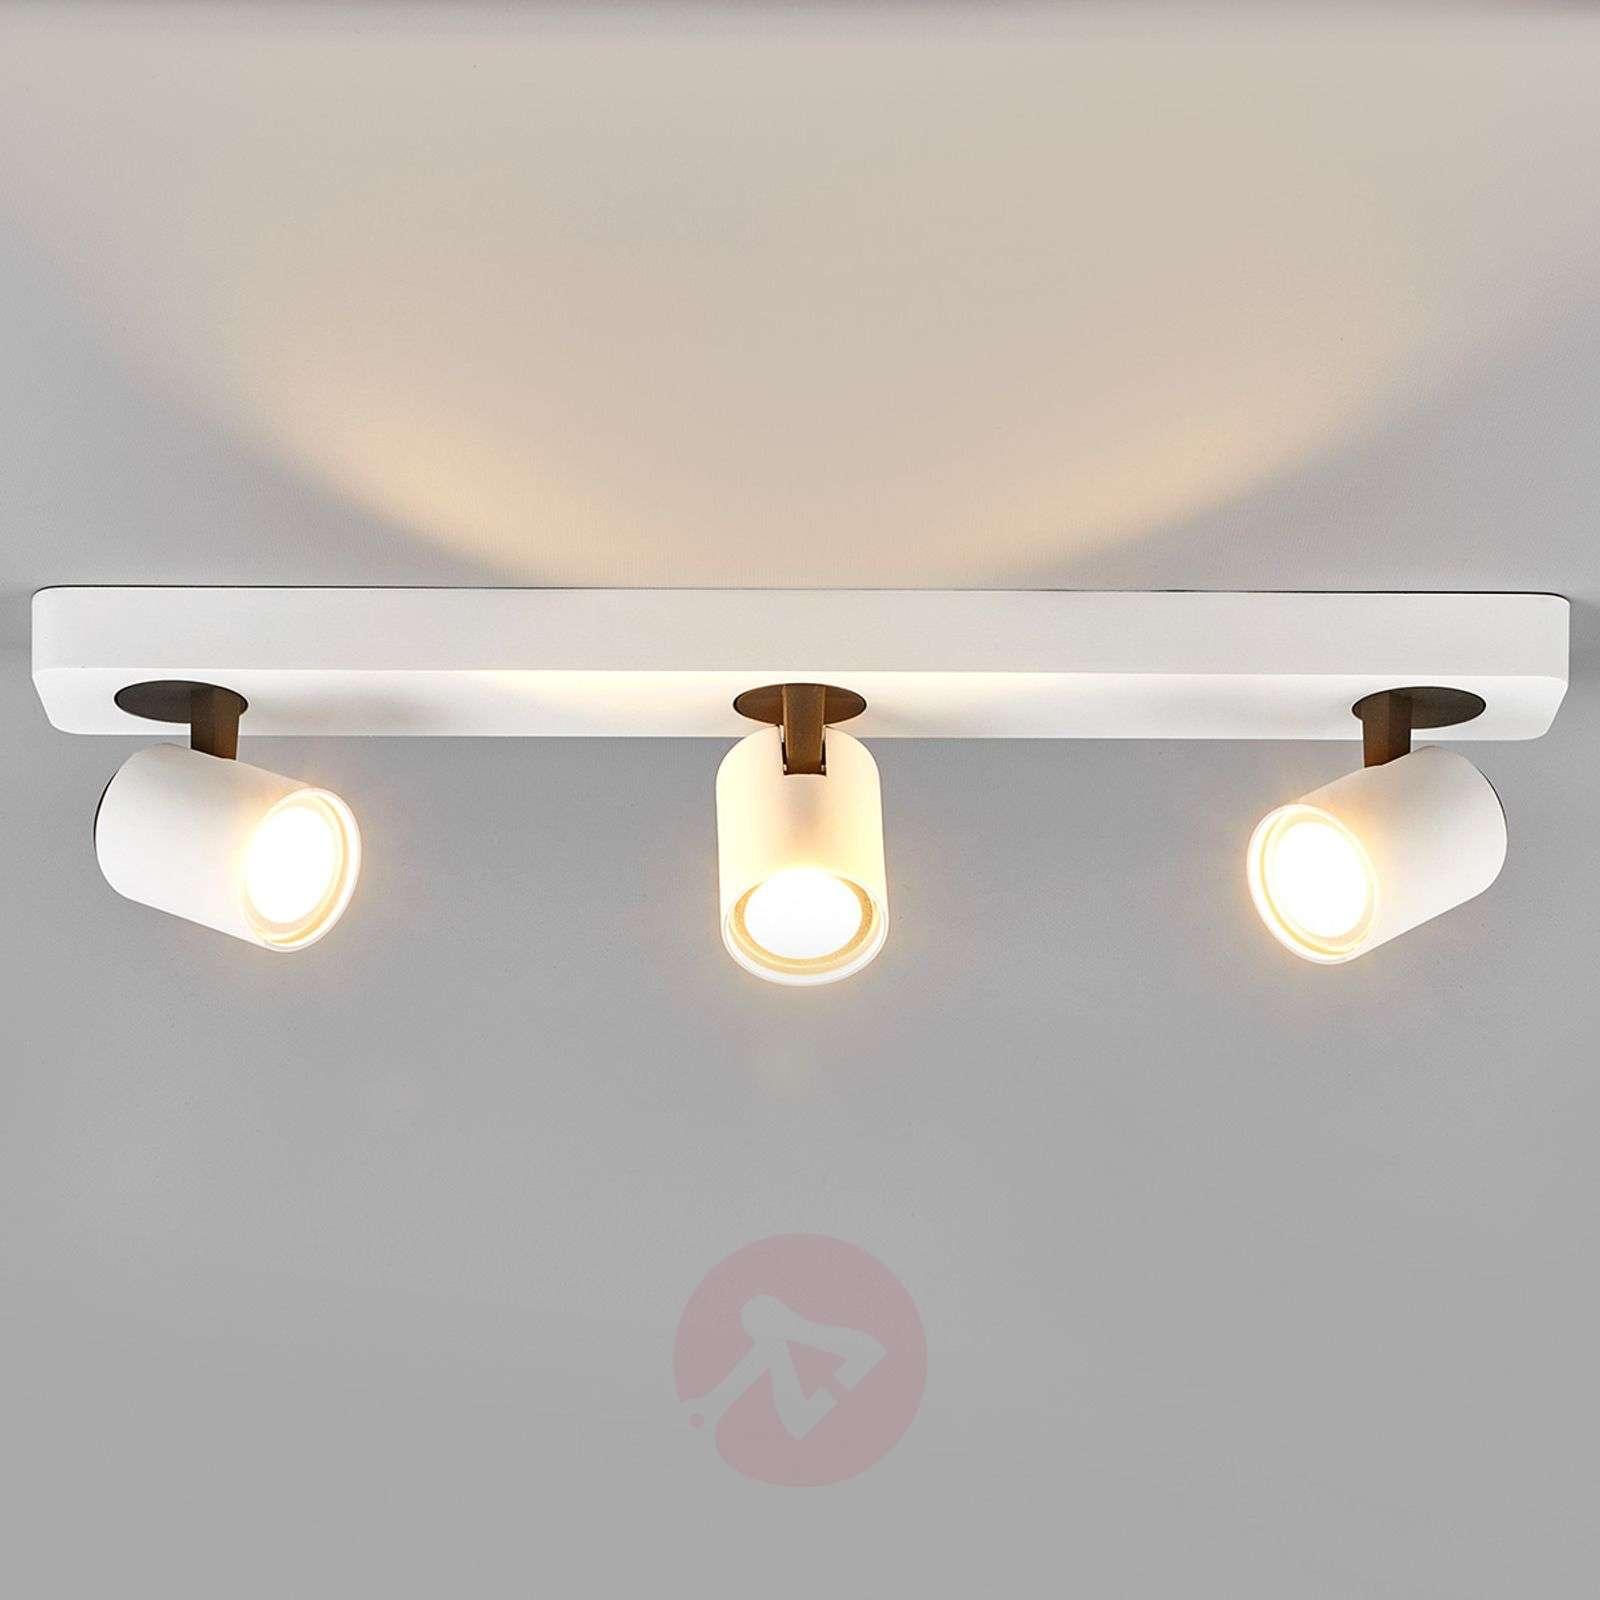 3-bulb LED spotlight in white Sean-9975020-01